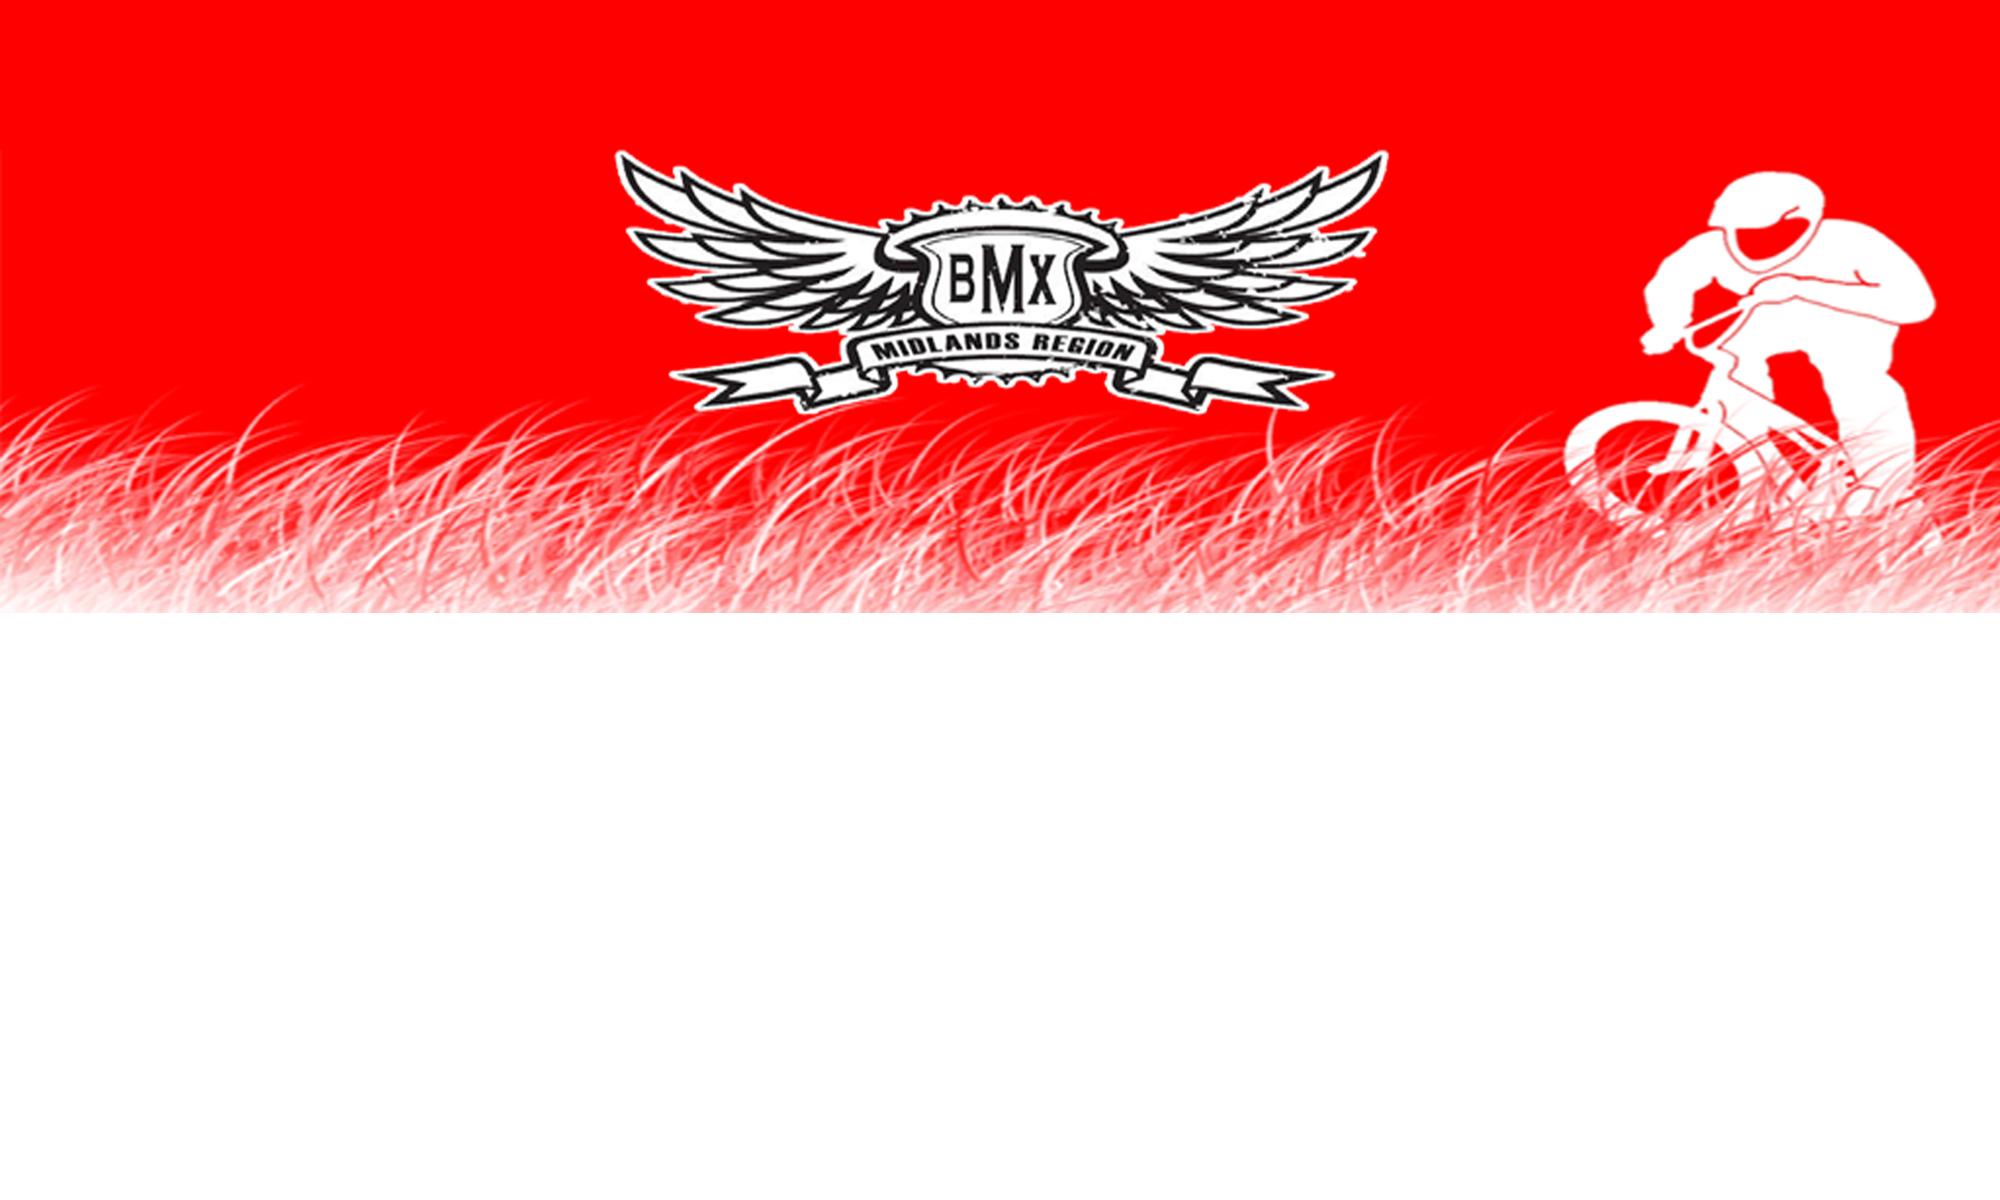 Midlands Regional BMX